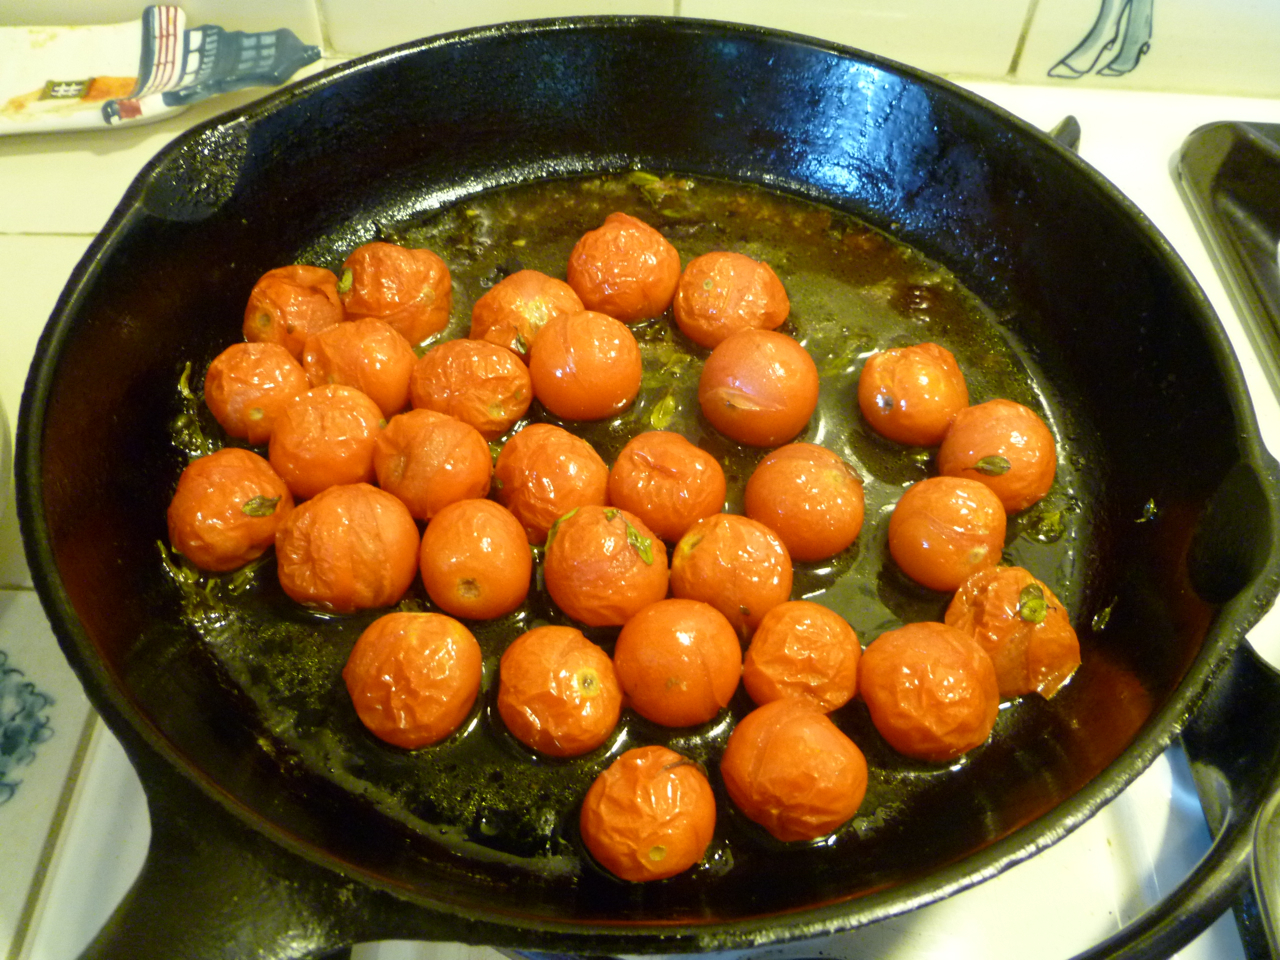 Fairmount Neighborhood Farmers Market: Leek and Cherry Tomato Clafouti